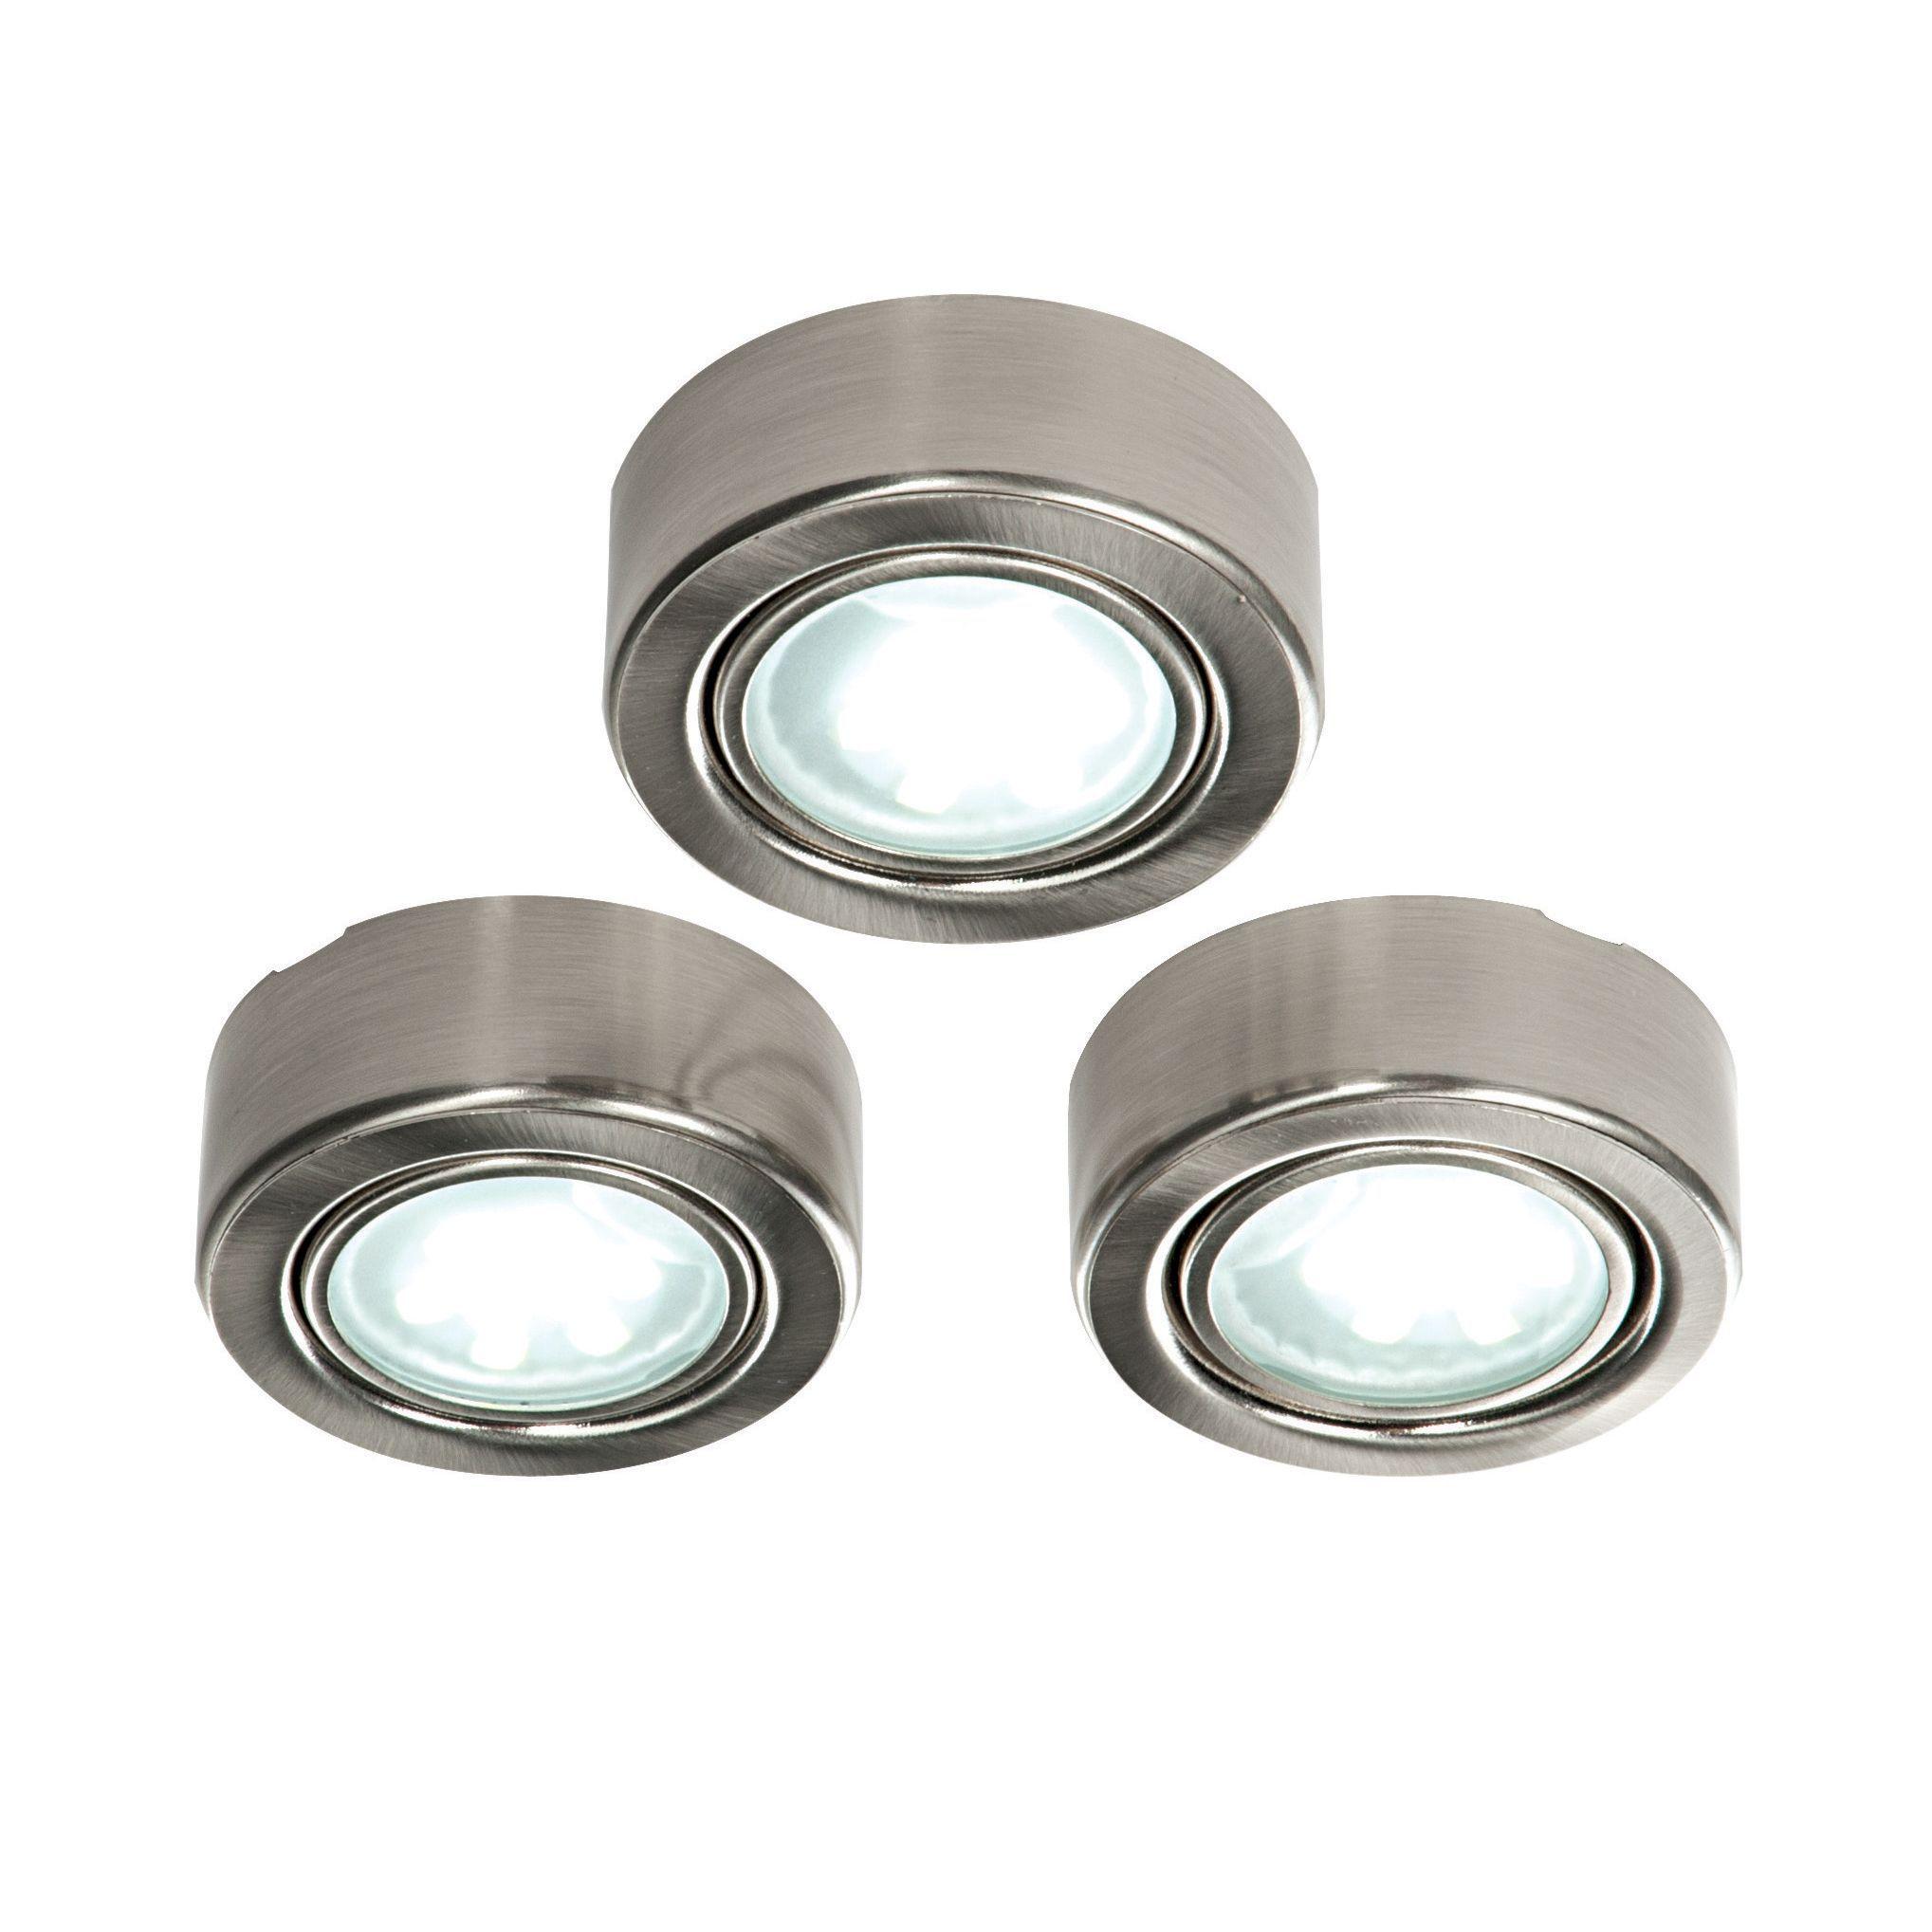 Masterlite Mains Powered LED Cabinet Light, Pack Of 3